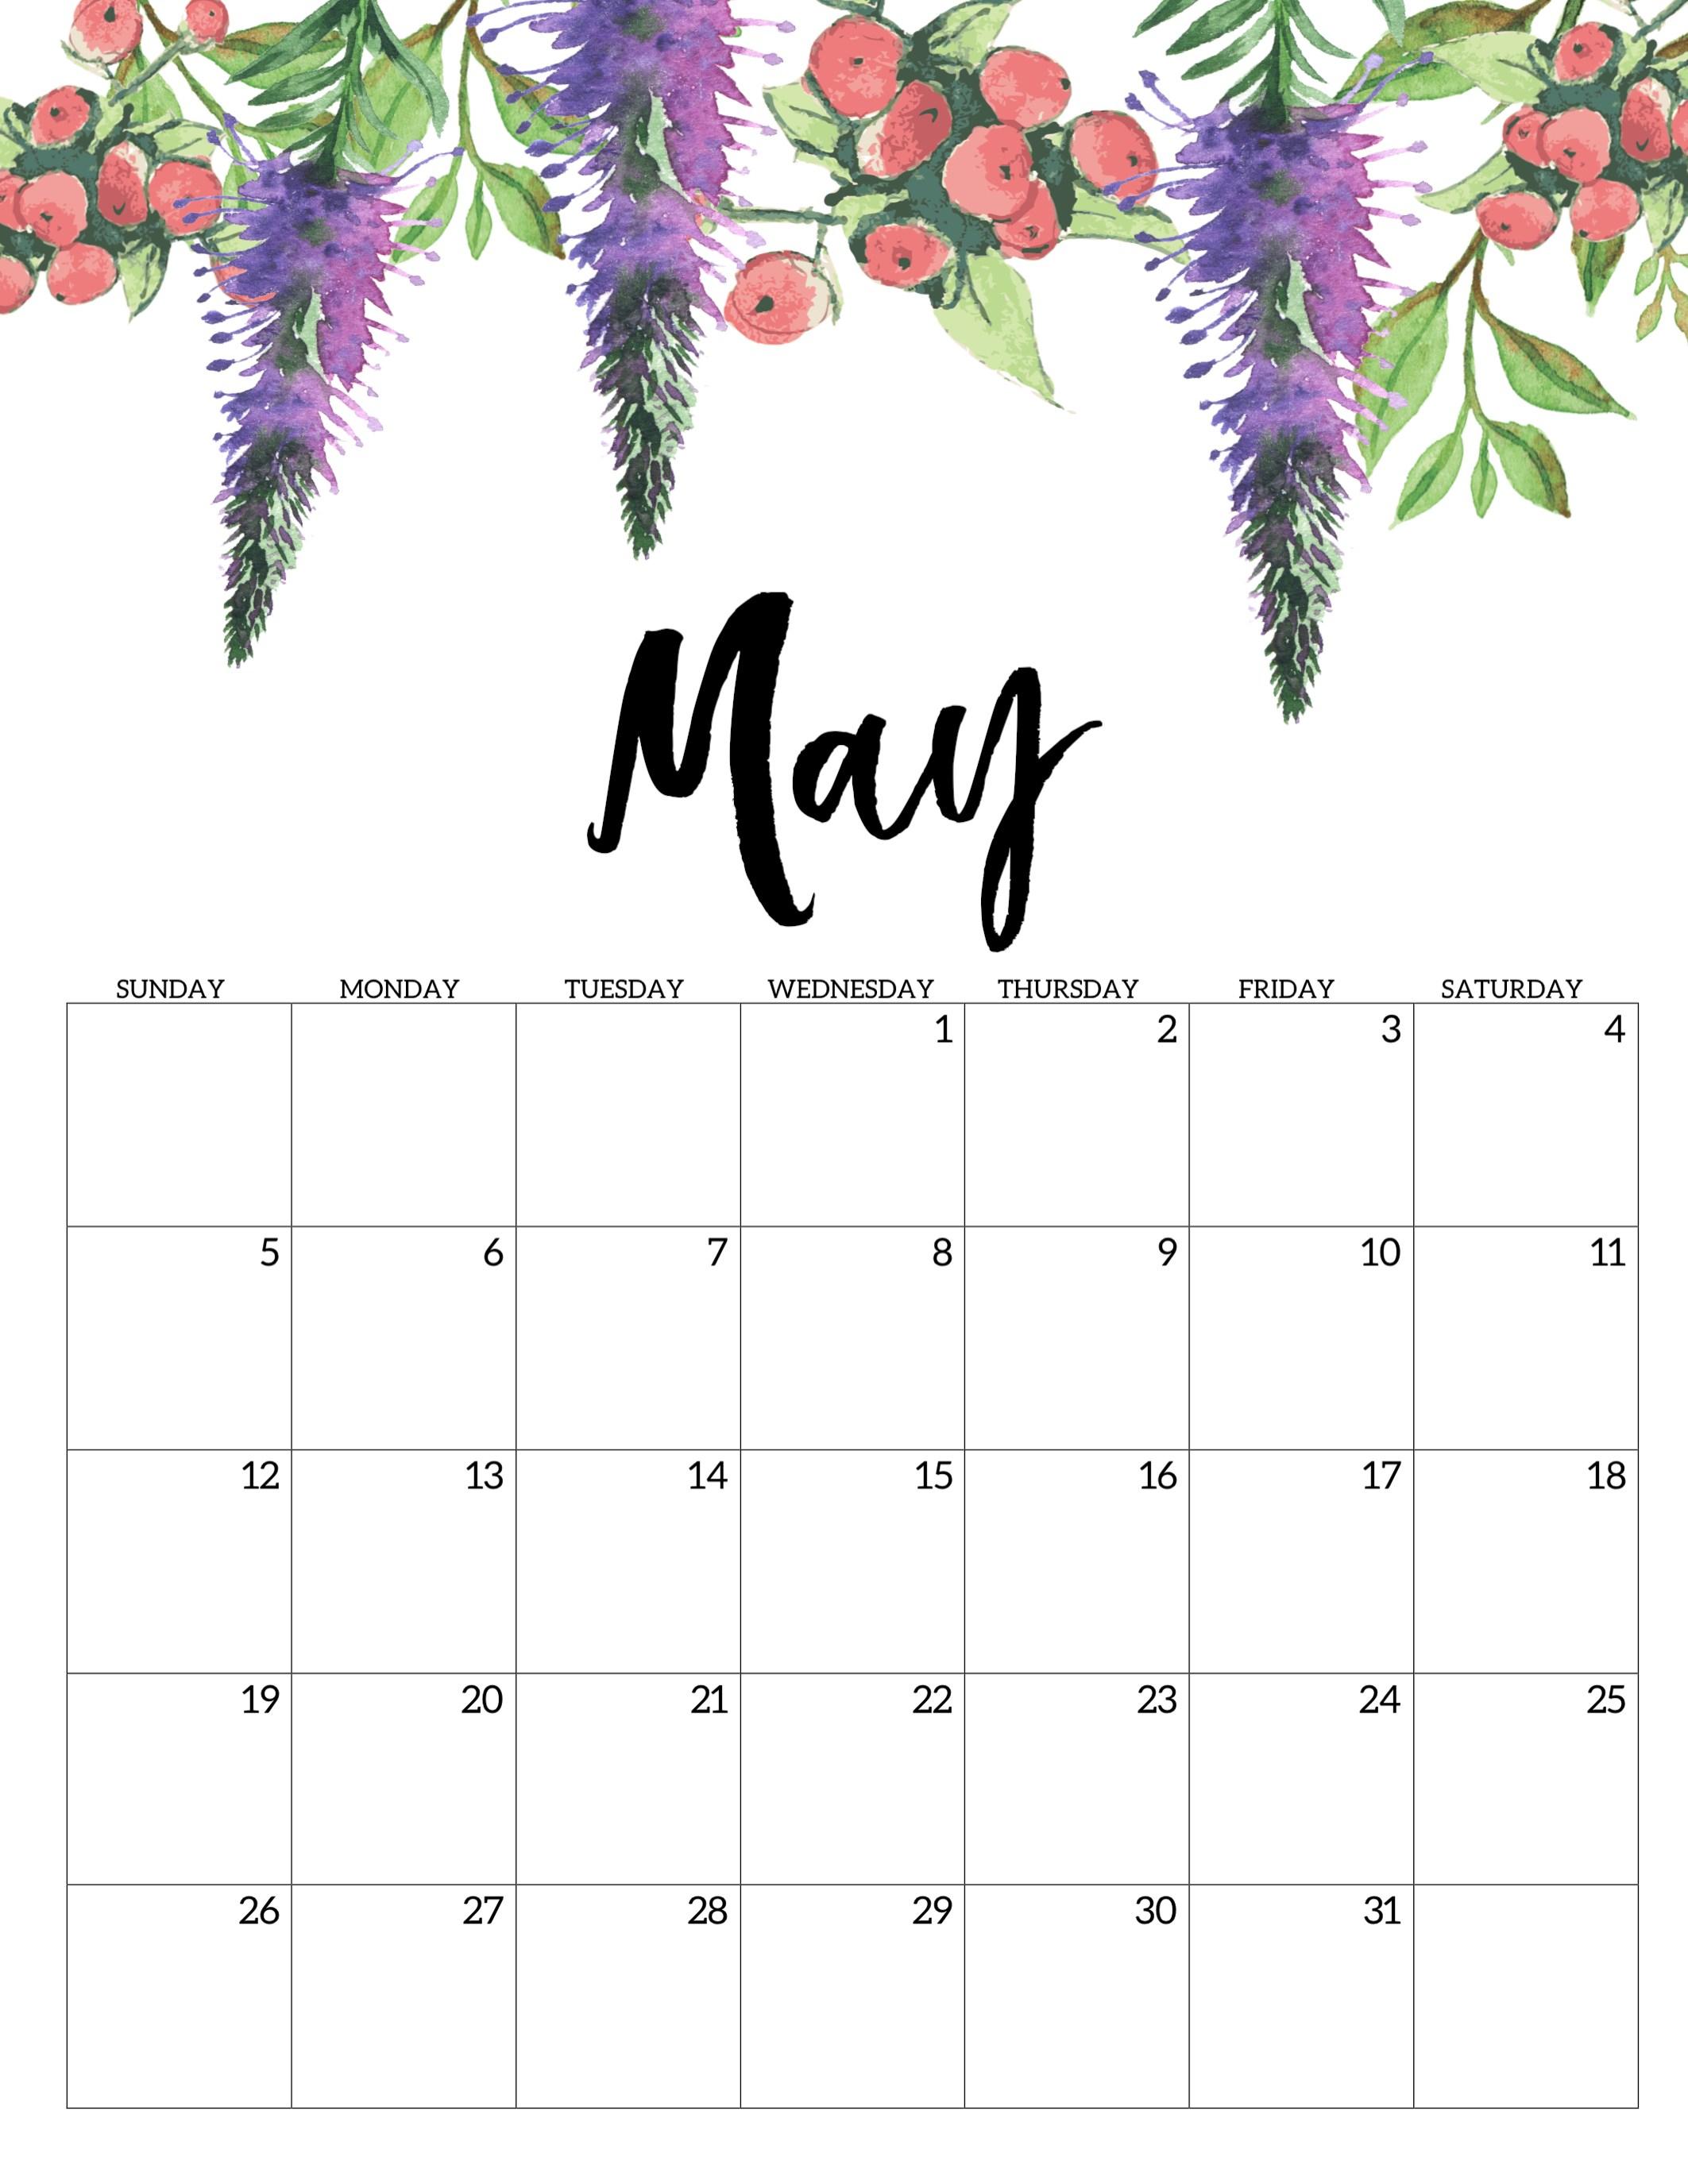 Free Printable Calendar 2019 - Floral - Paper Trail Design inside Frame Birthday Calendar Templates Free